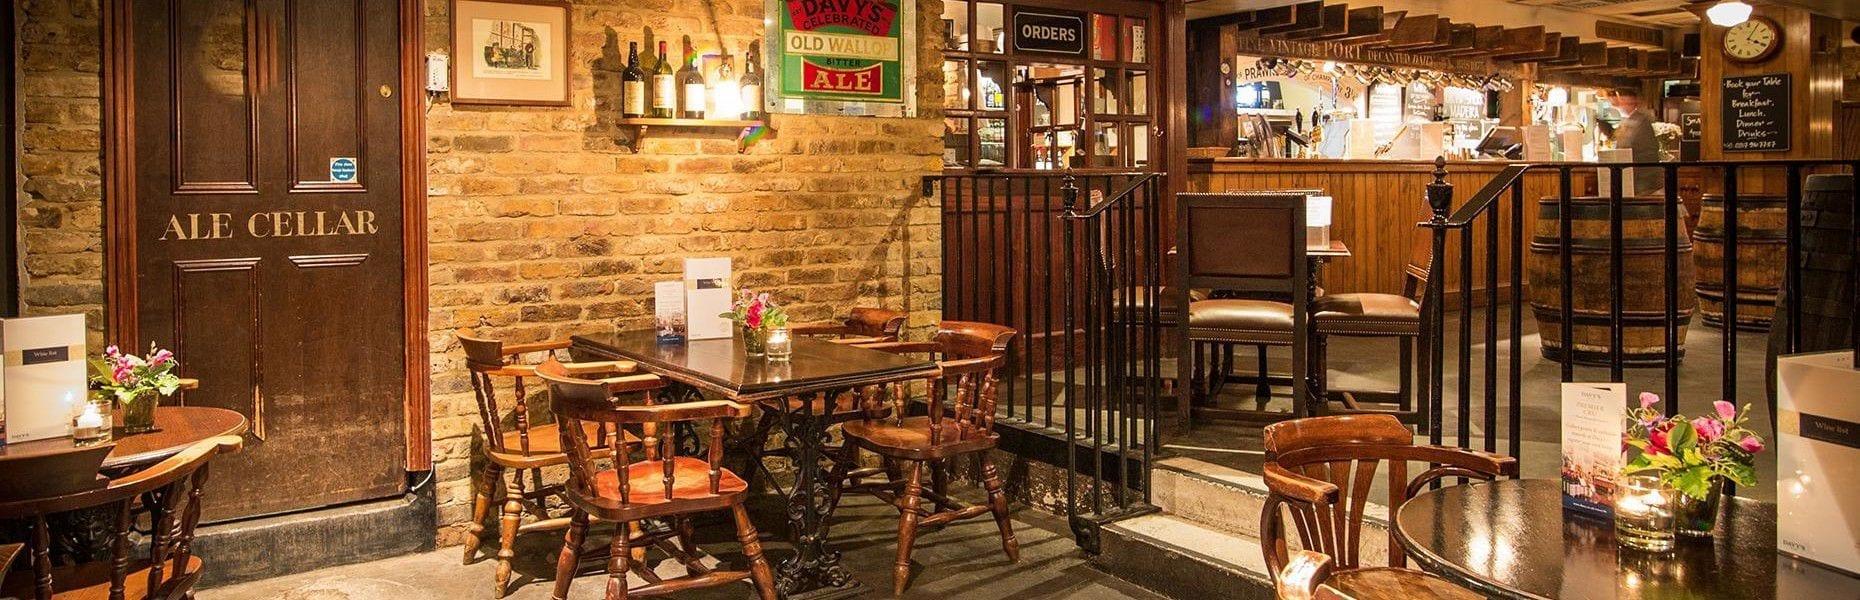 Champagne Charlie's bar